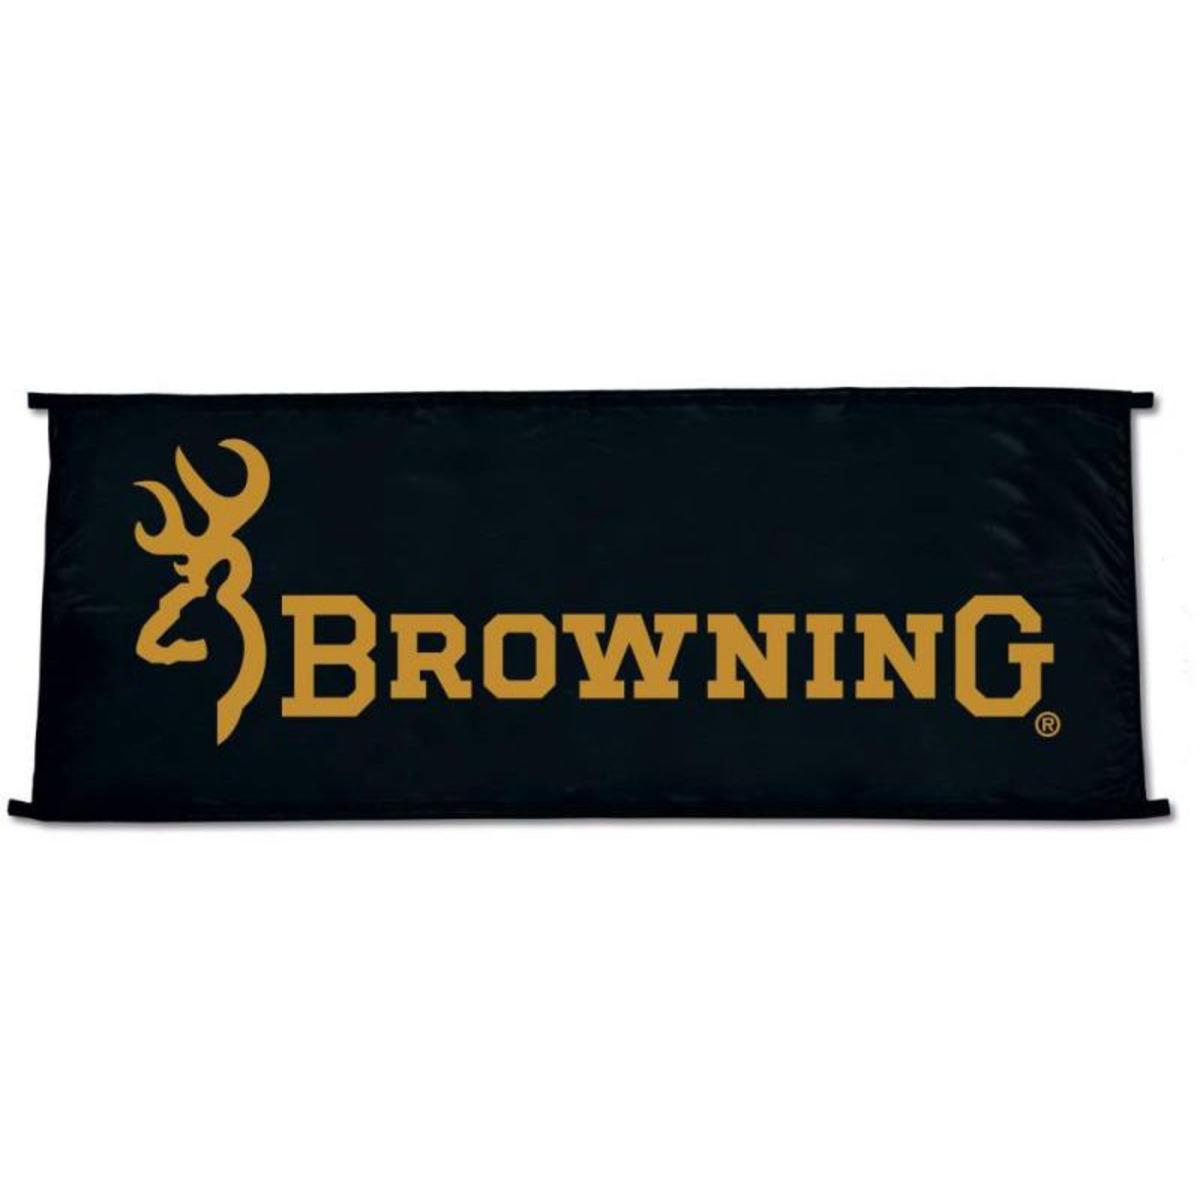 Browning Banner - 200 cm x 80 cm